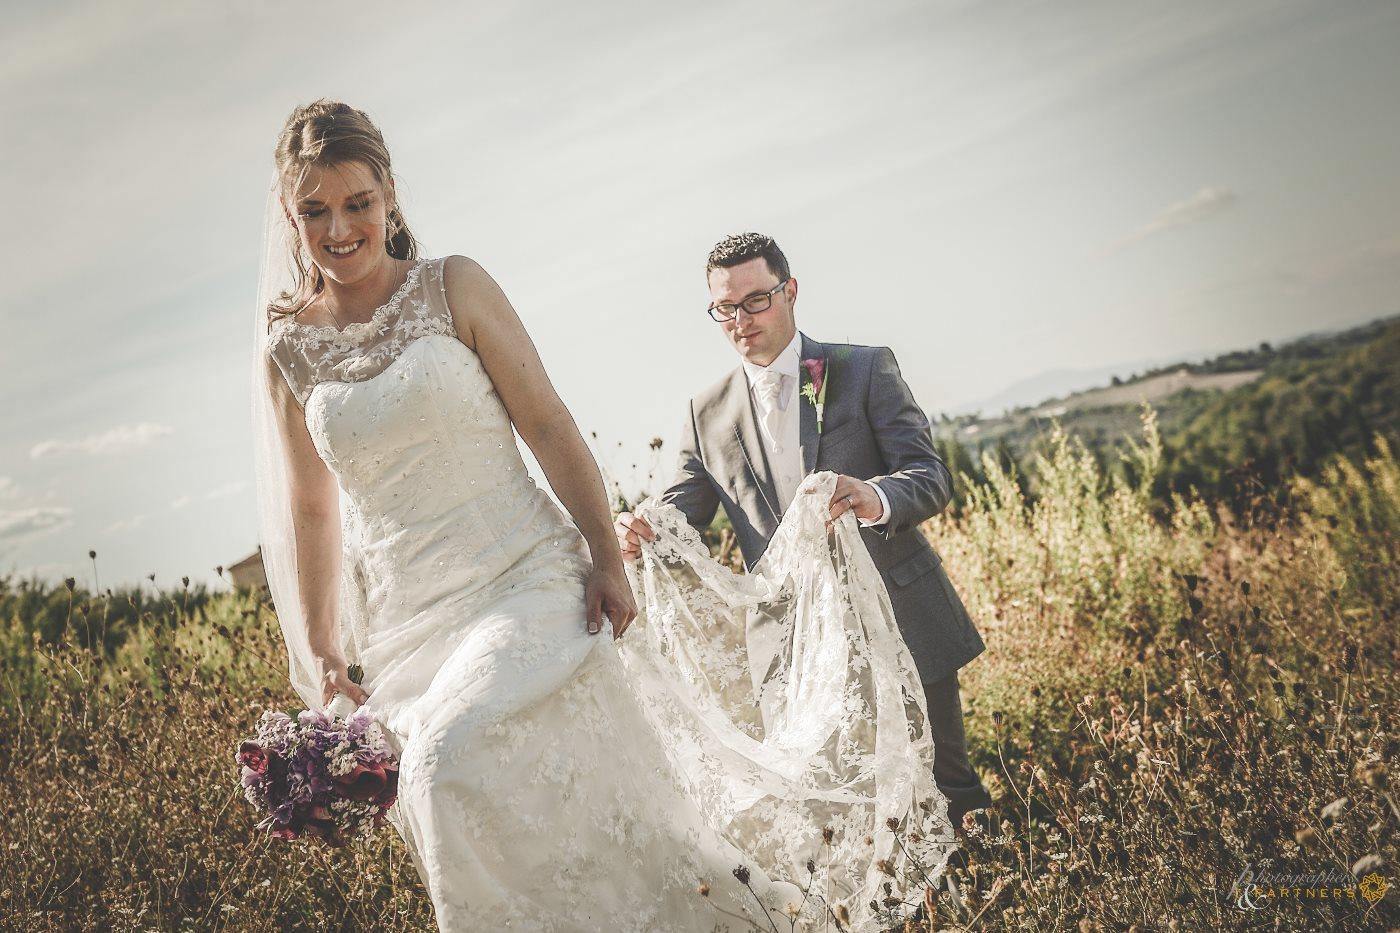 wedding_photos_sticciano_18.jpg